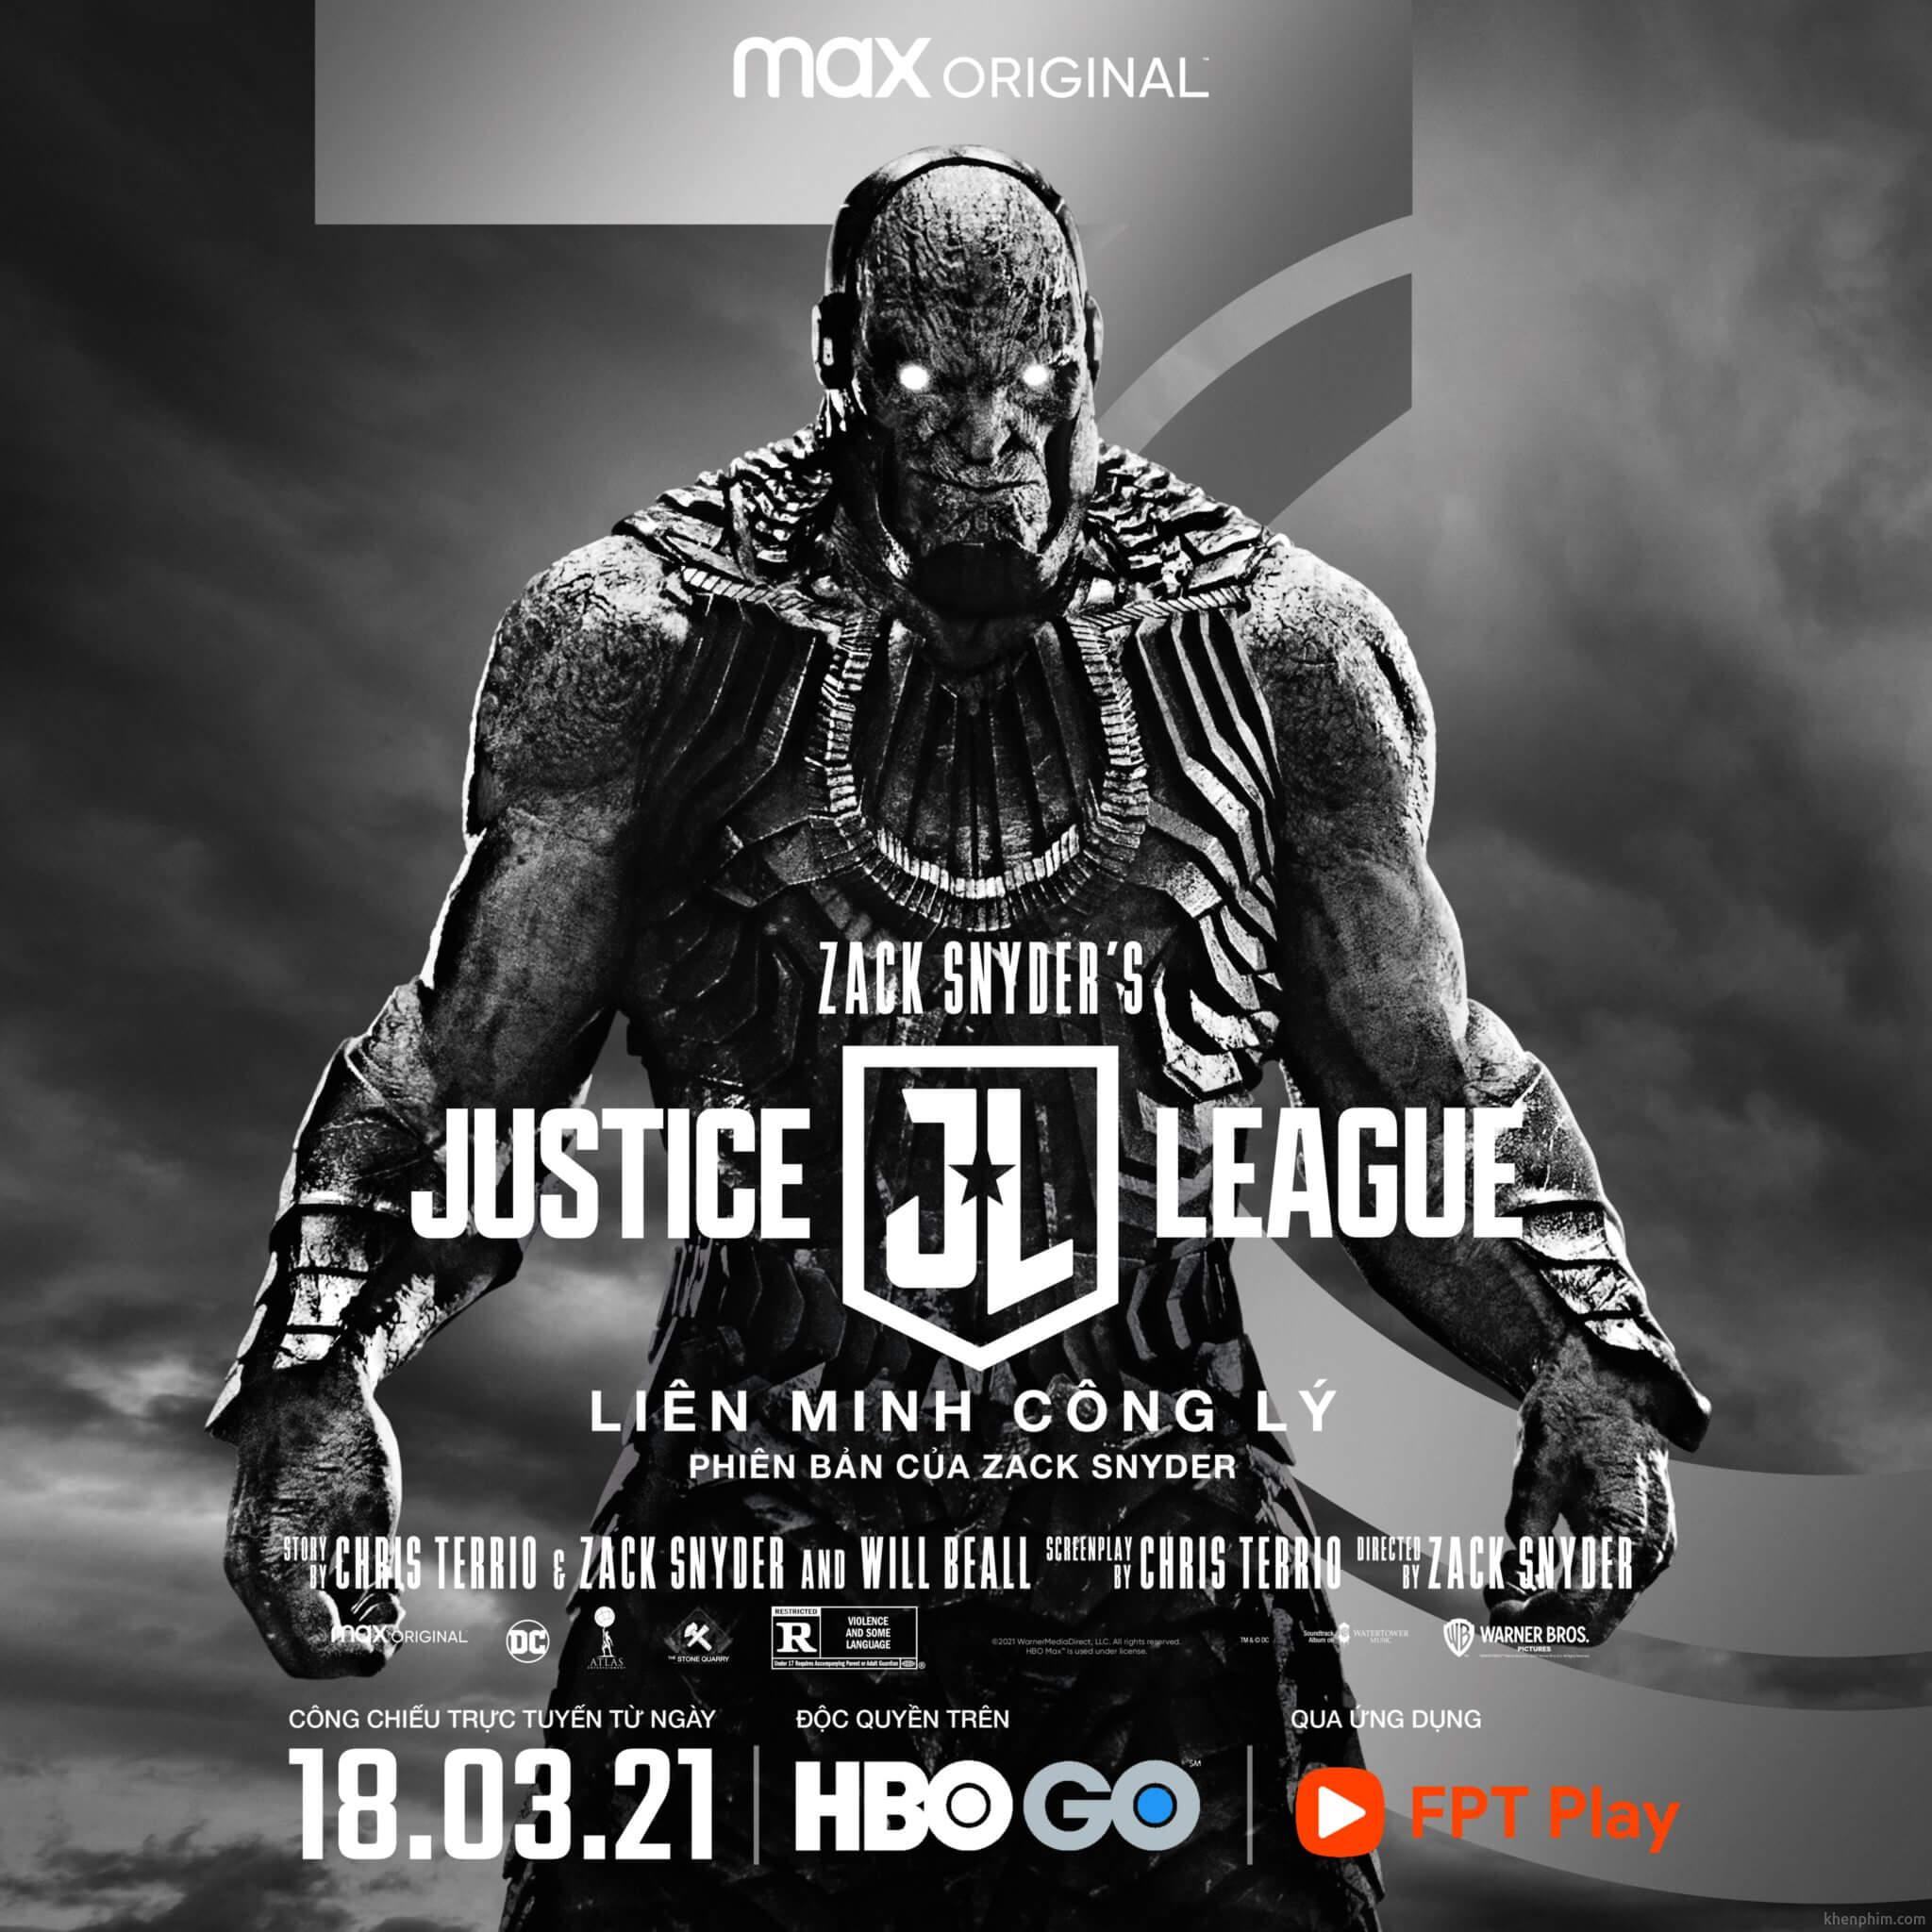 Poster nhân vật trong phim Zack Snyder's Justice League - Darkreid